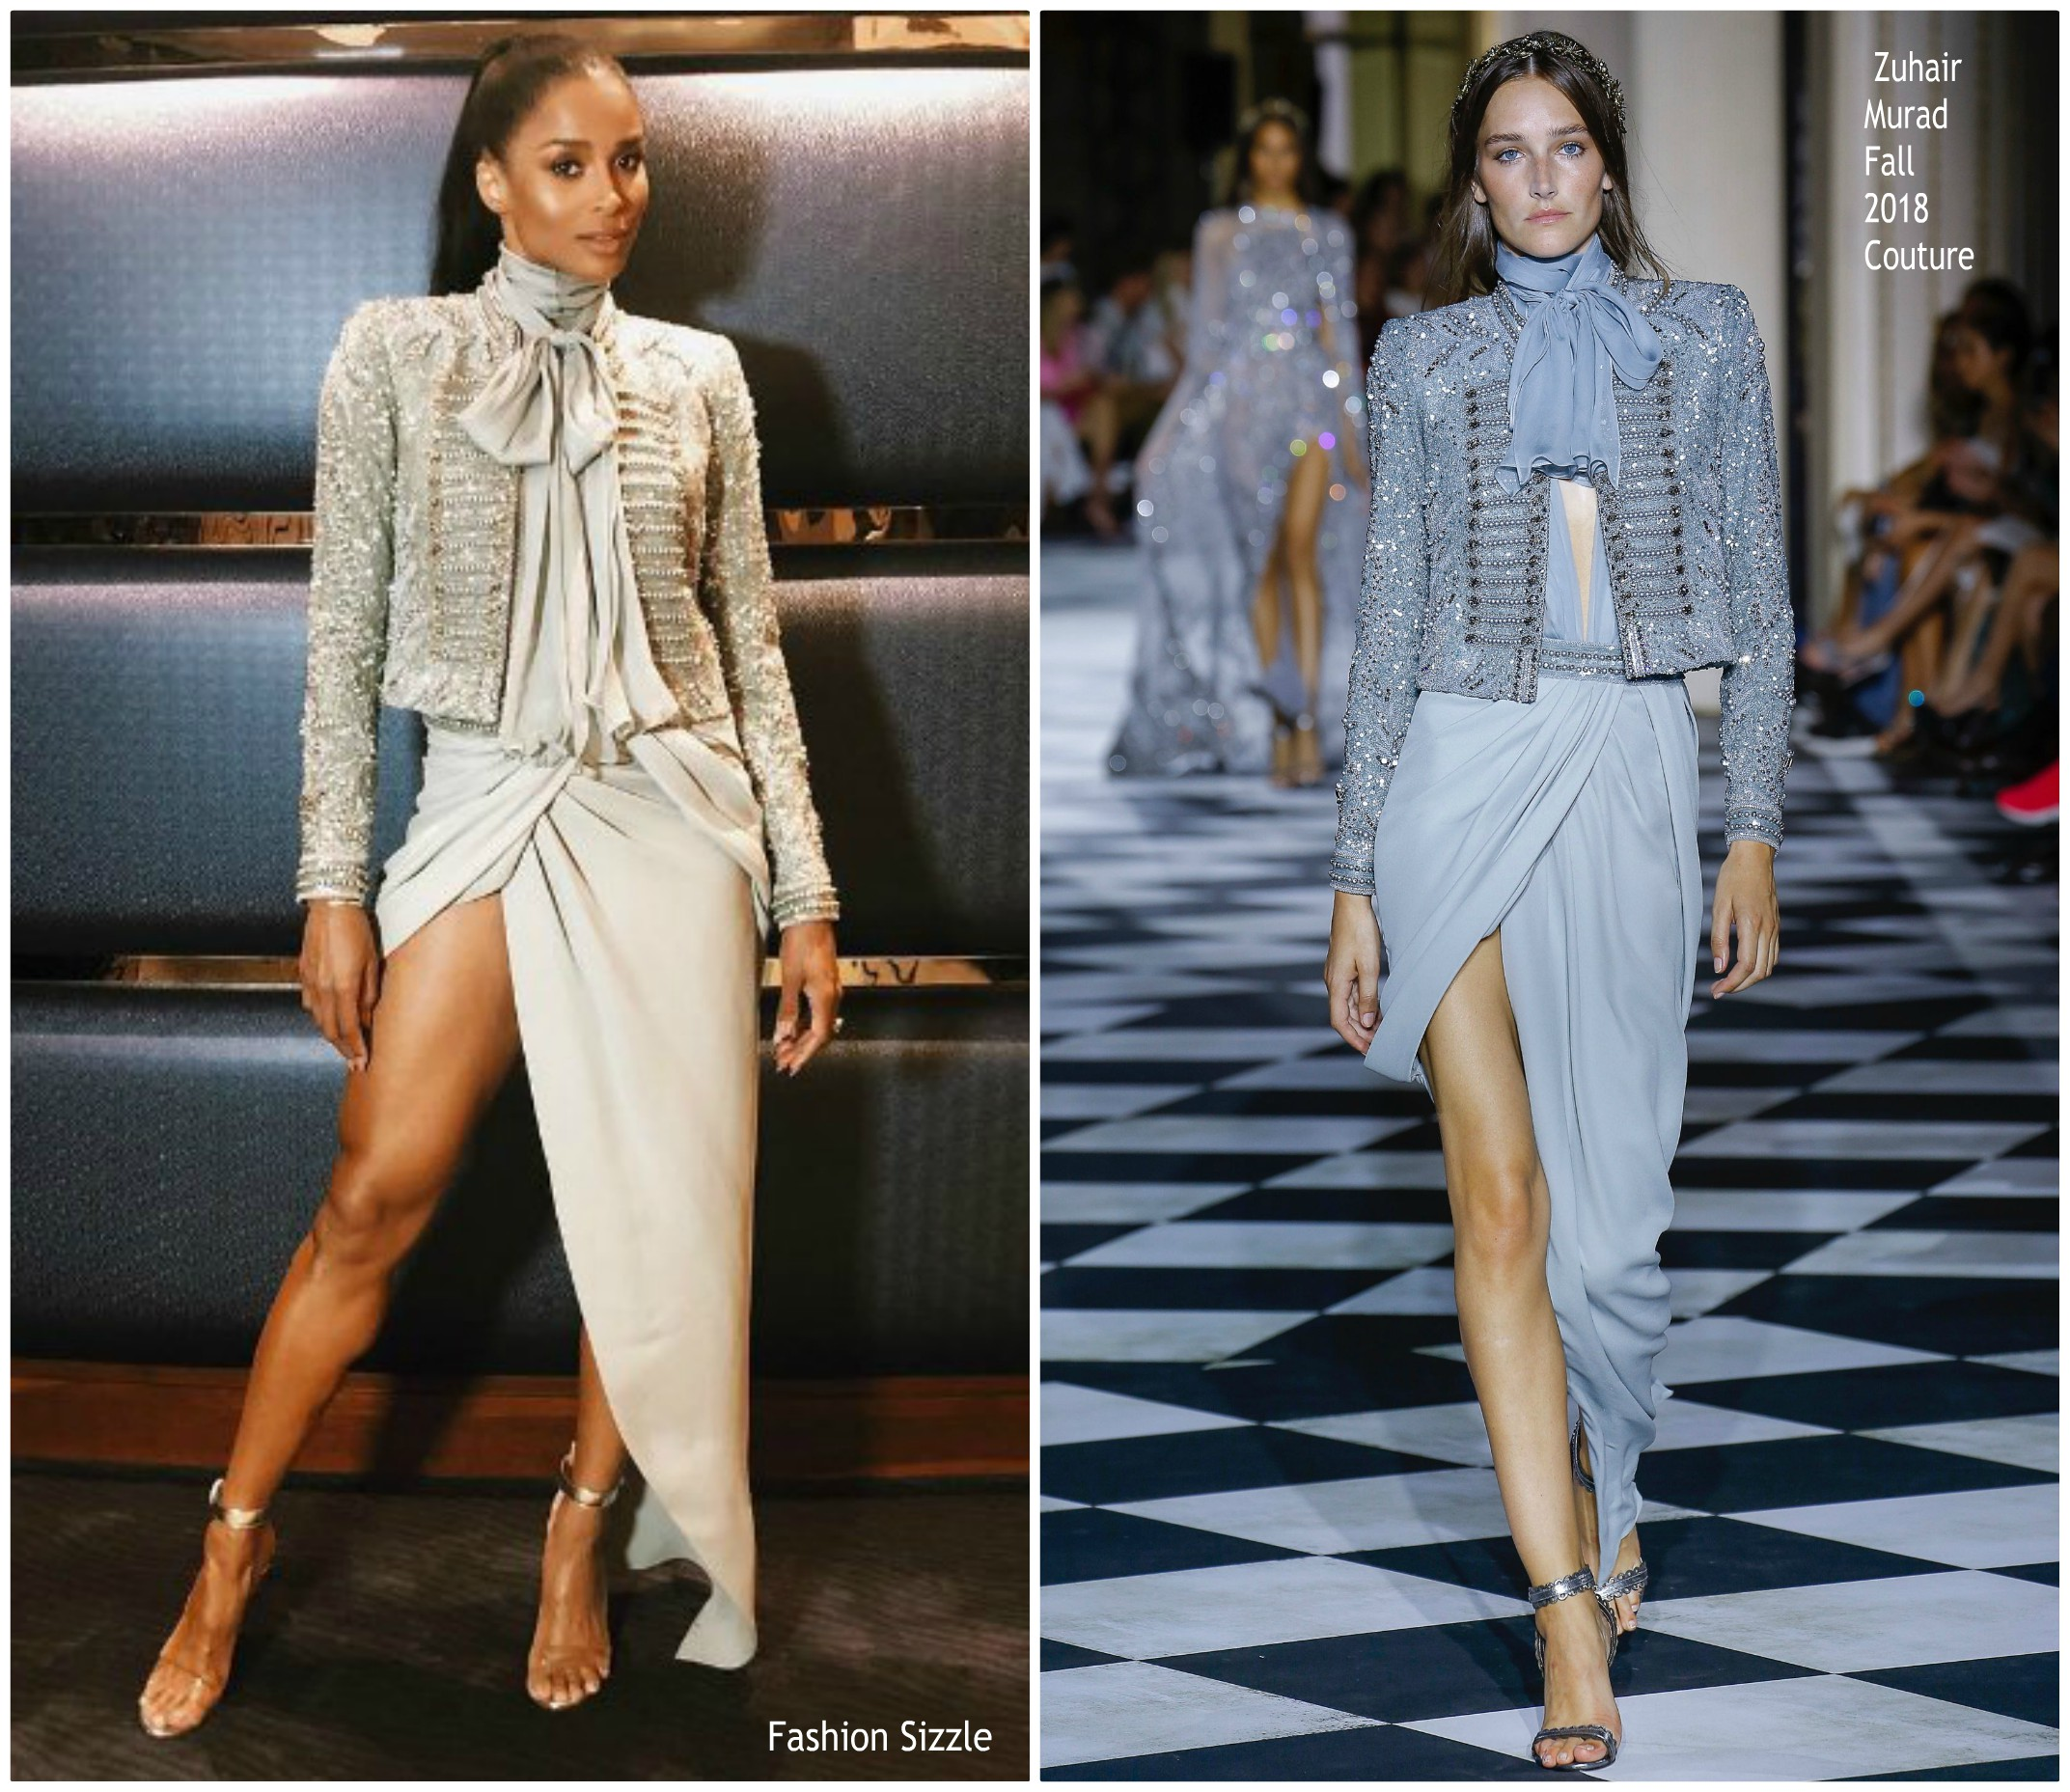 ciara-in-zuhaie-murad-couture-ball-of-arabia-